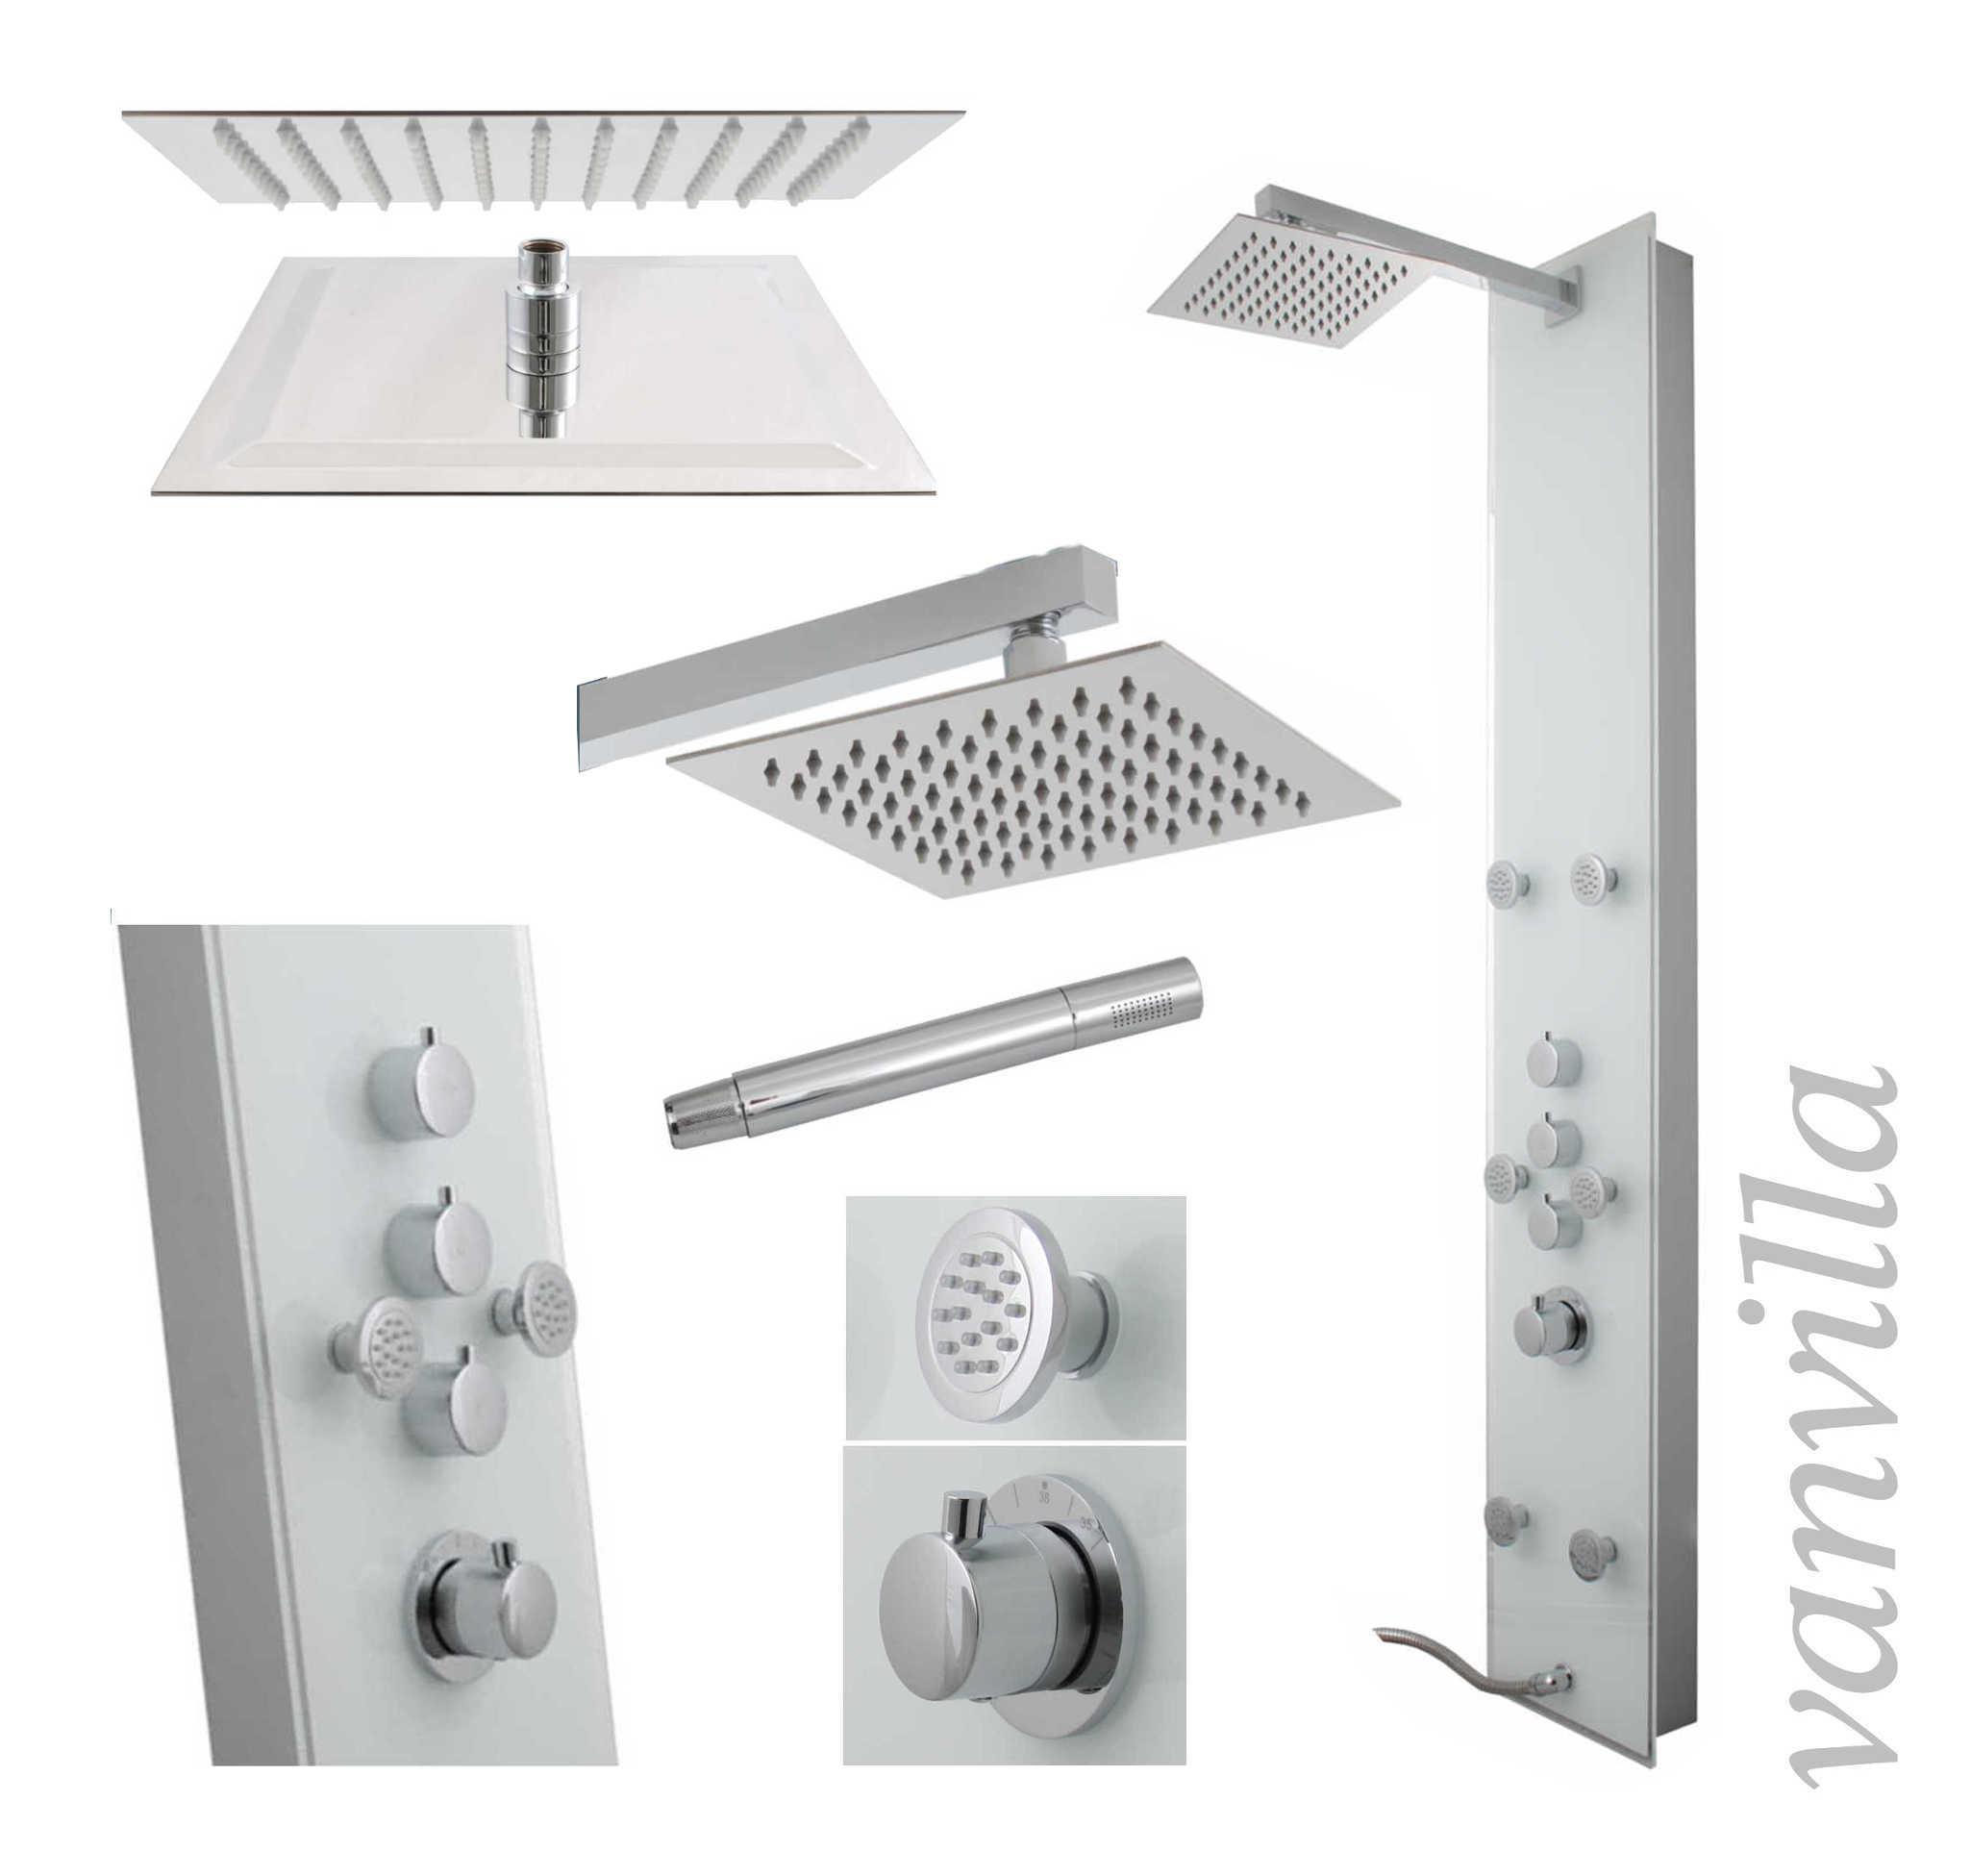 duschpaneel thermostat glas duschs ule brausepaneel regendusche duscharmatur ebay. Black Bedroom Furniture Sets. Home Design Ideas